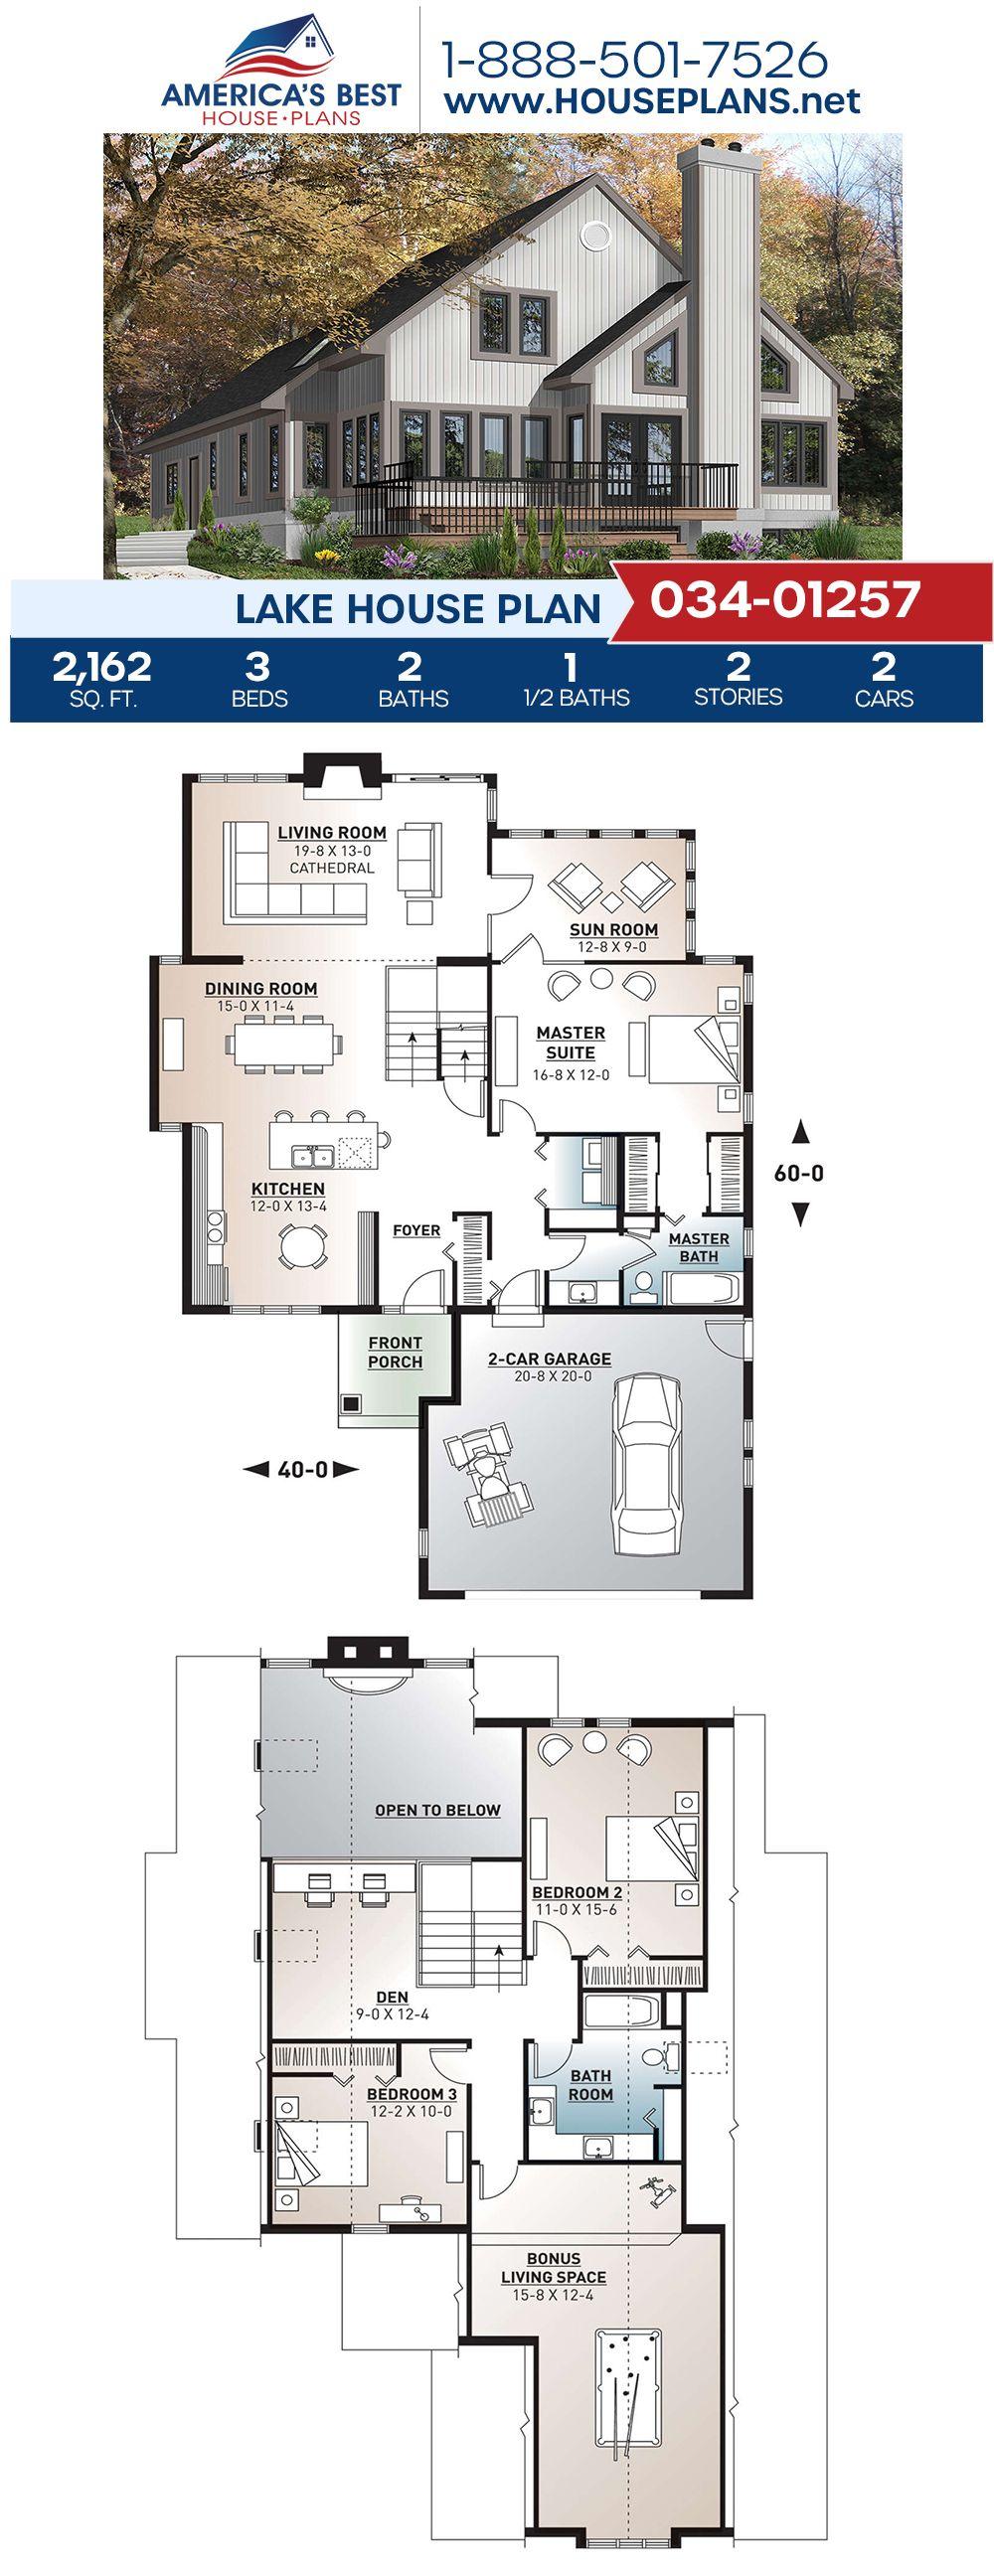 House Plan 034 01257 Lake Front Plan 2 162 Square Feet 3 Bedrooms 2 5 Bathrooms In 2020 Lake House Plans Lake House House Blueprints